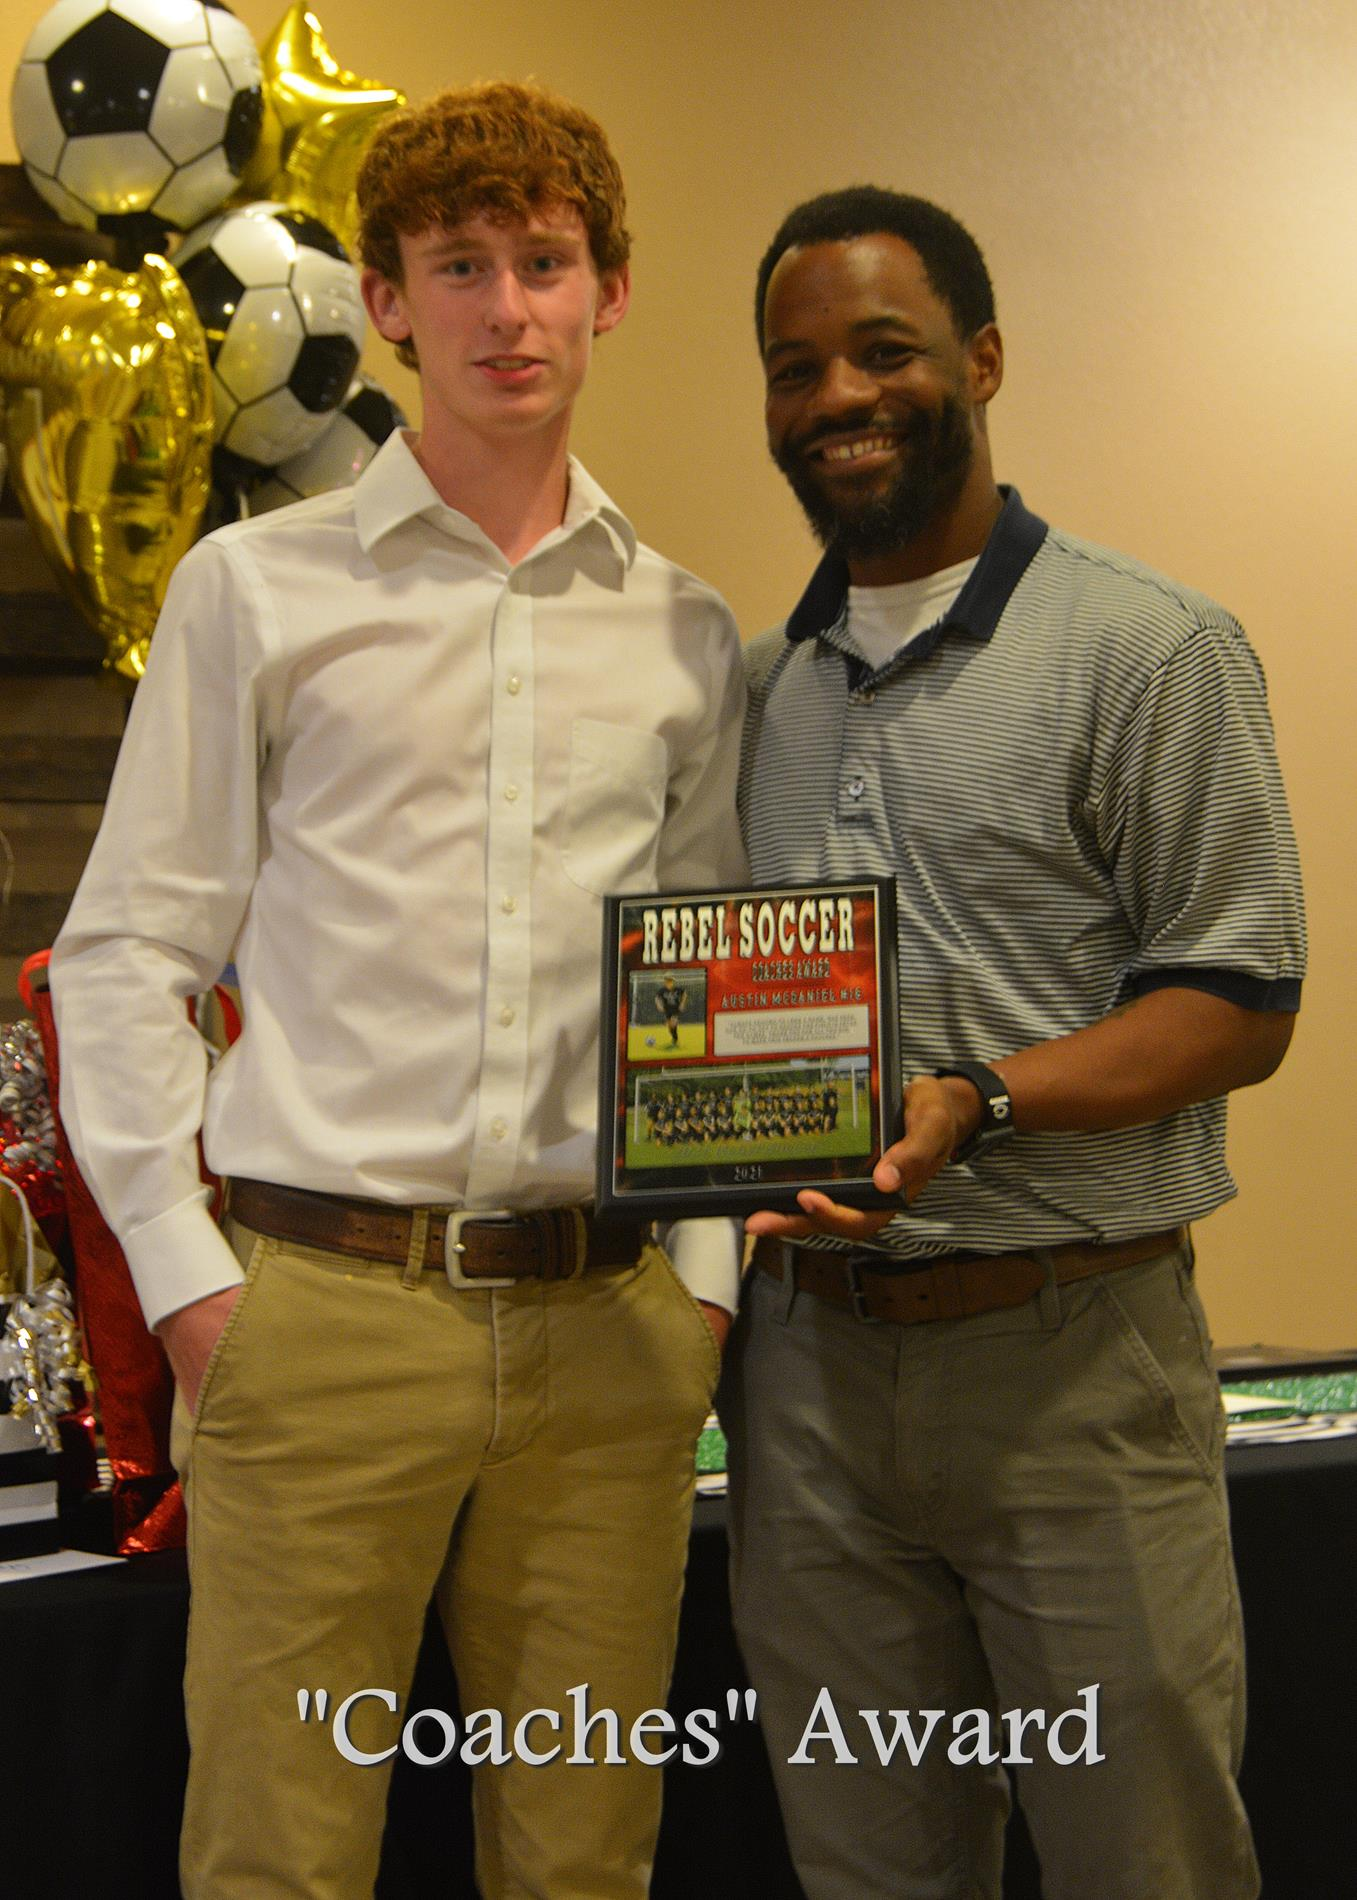 Austin McDaniel receiving the Coaches Award